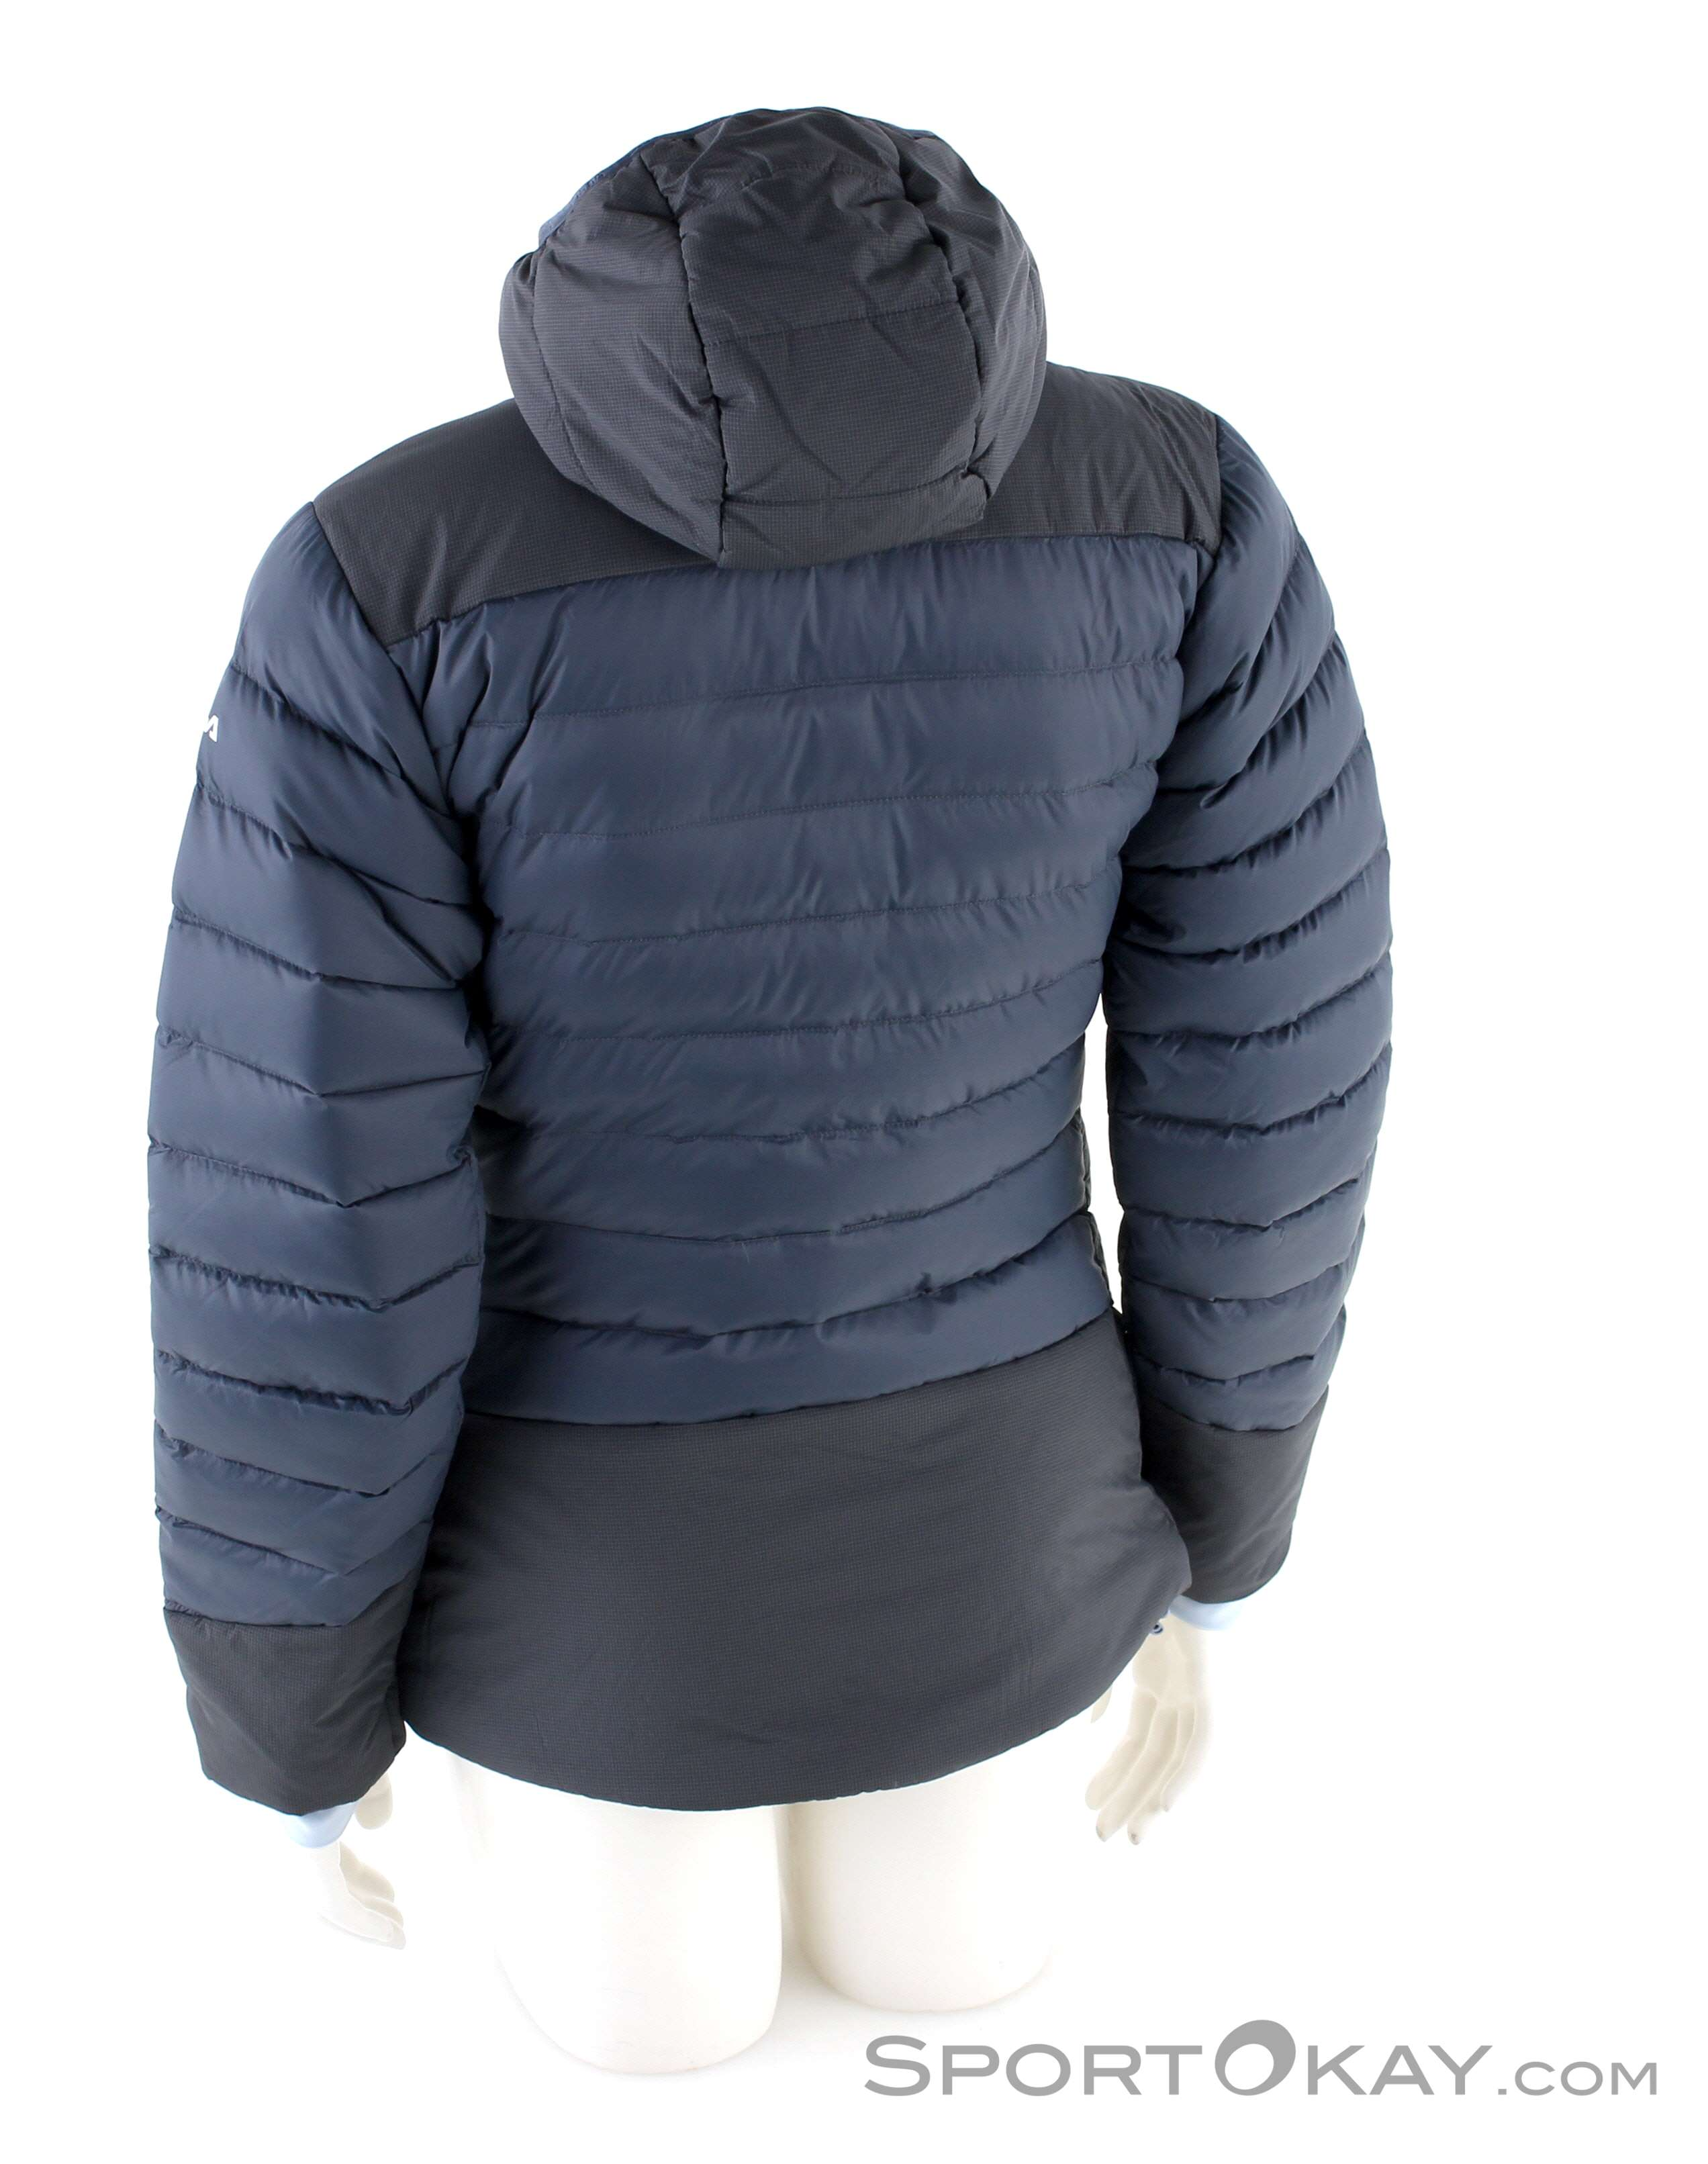 Camping & Outdoor Salewa Ortles Medium 2 DWN W Jacket black